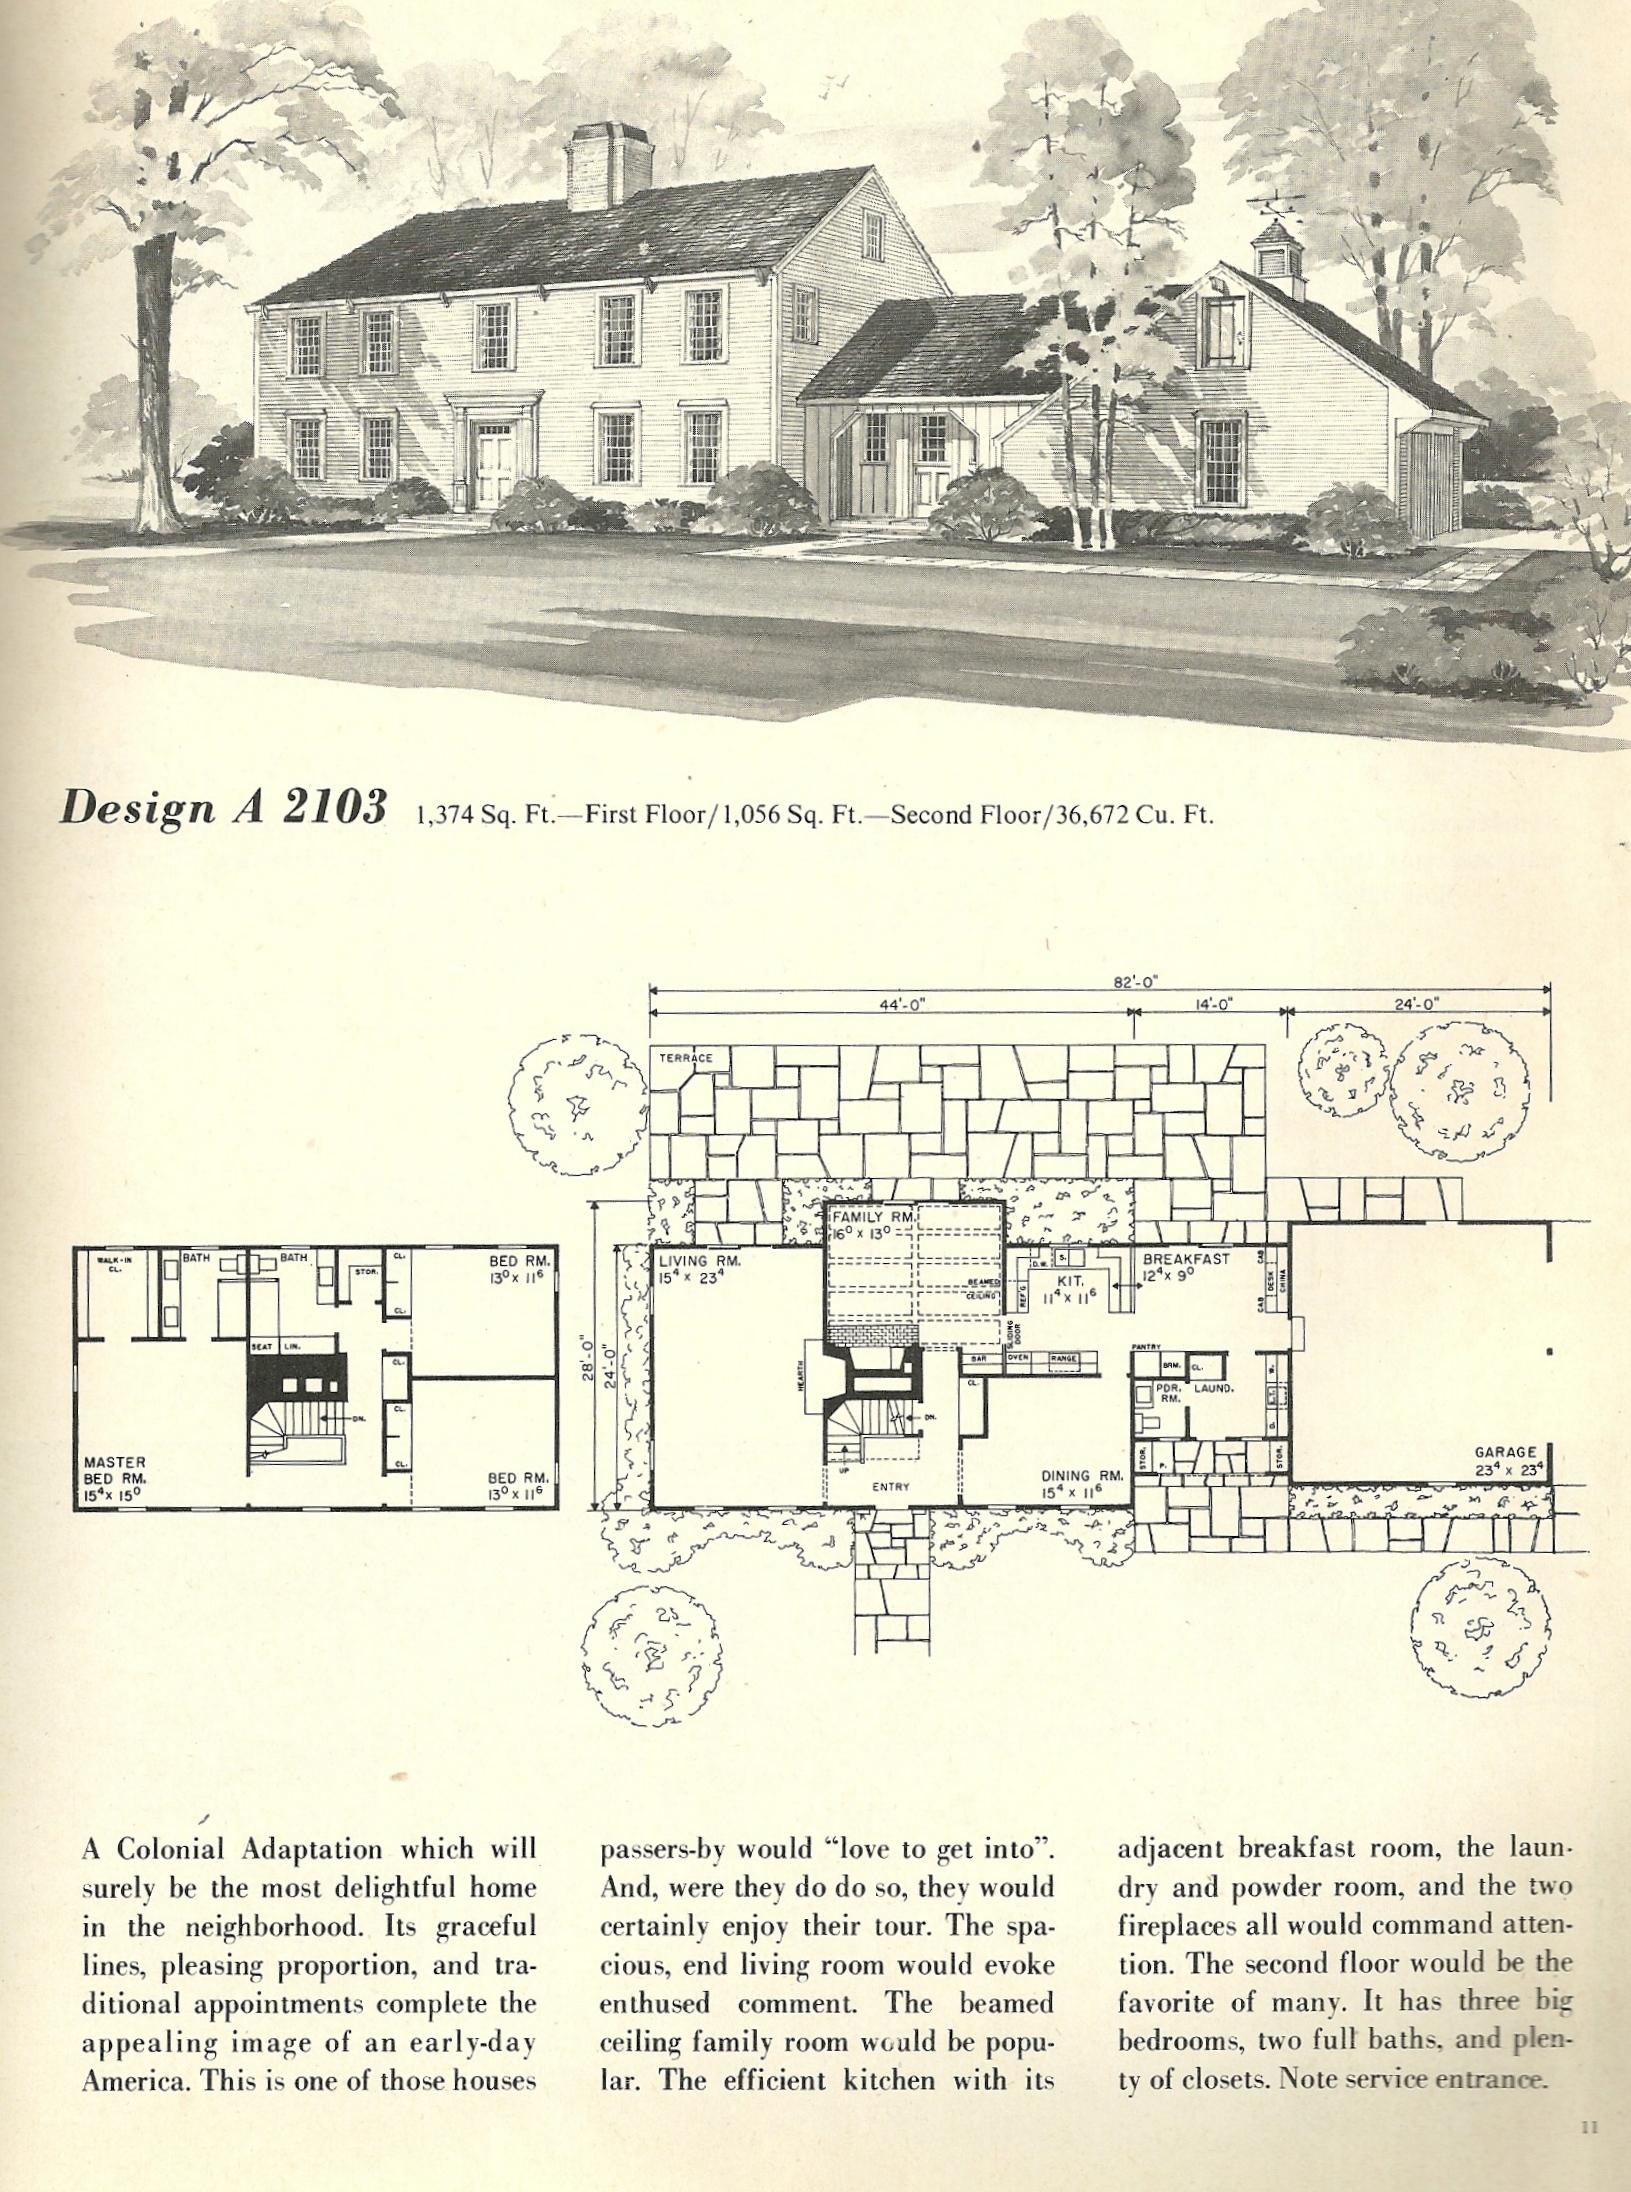 Vintage House Plans Salt Box 2103 Antique Alter Ego